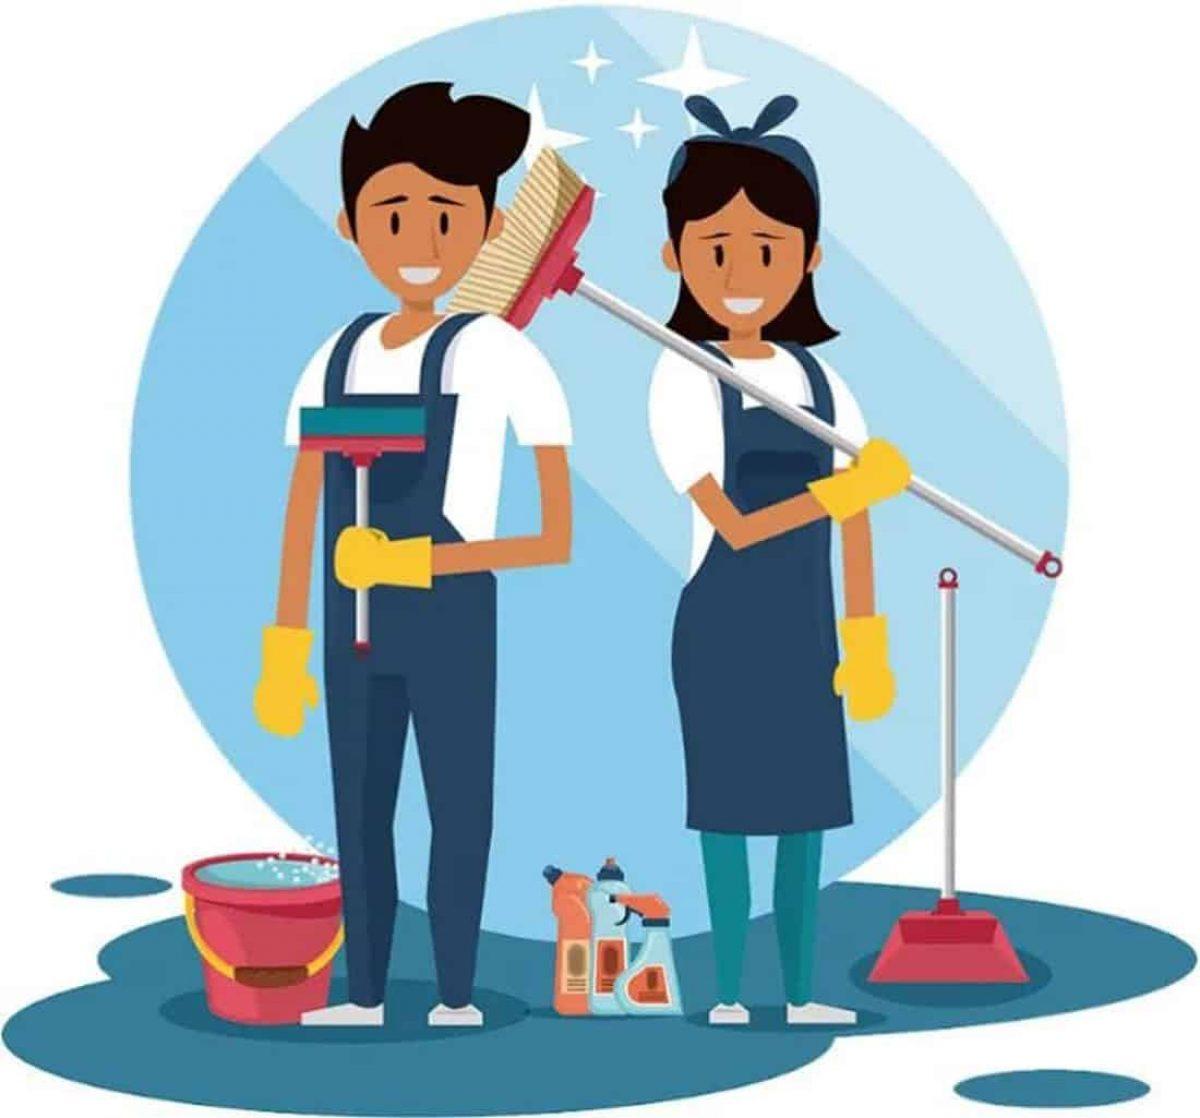 work-in-ibiza-2021-clean-and-iron-service-ibiza-welcometoibiza